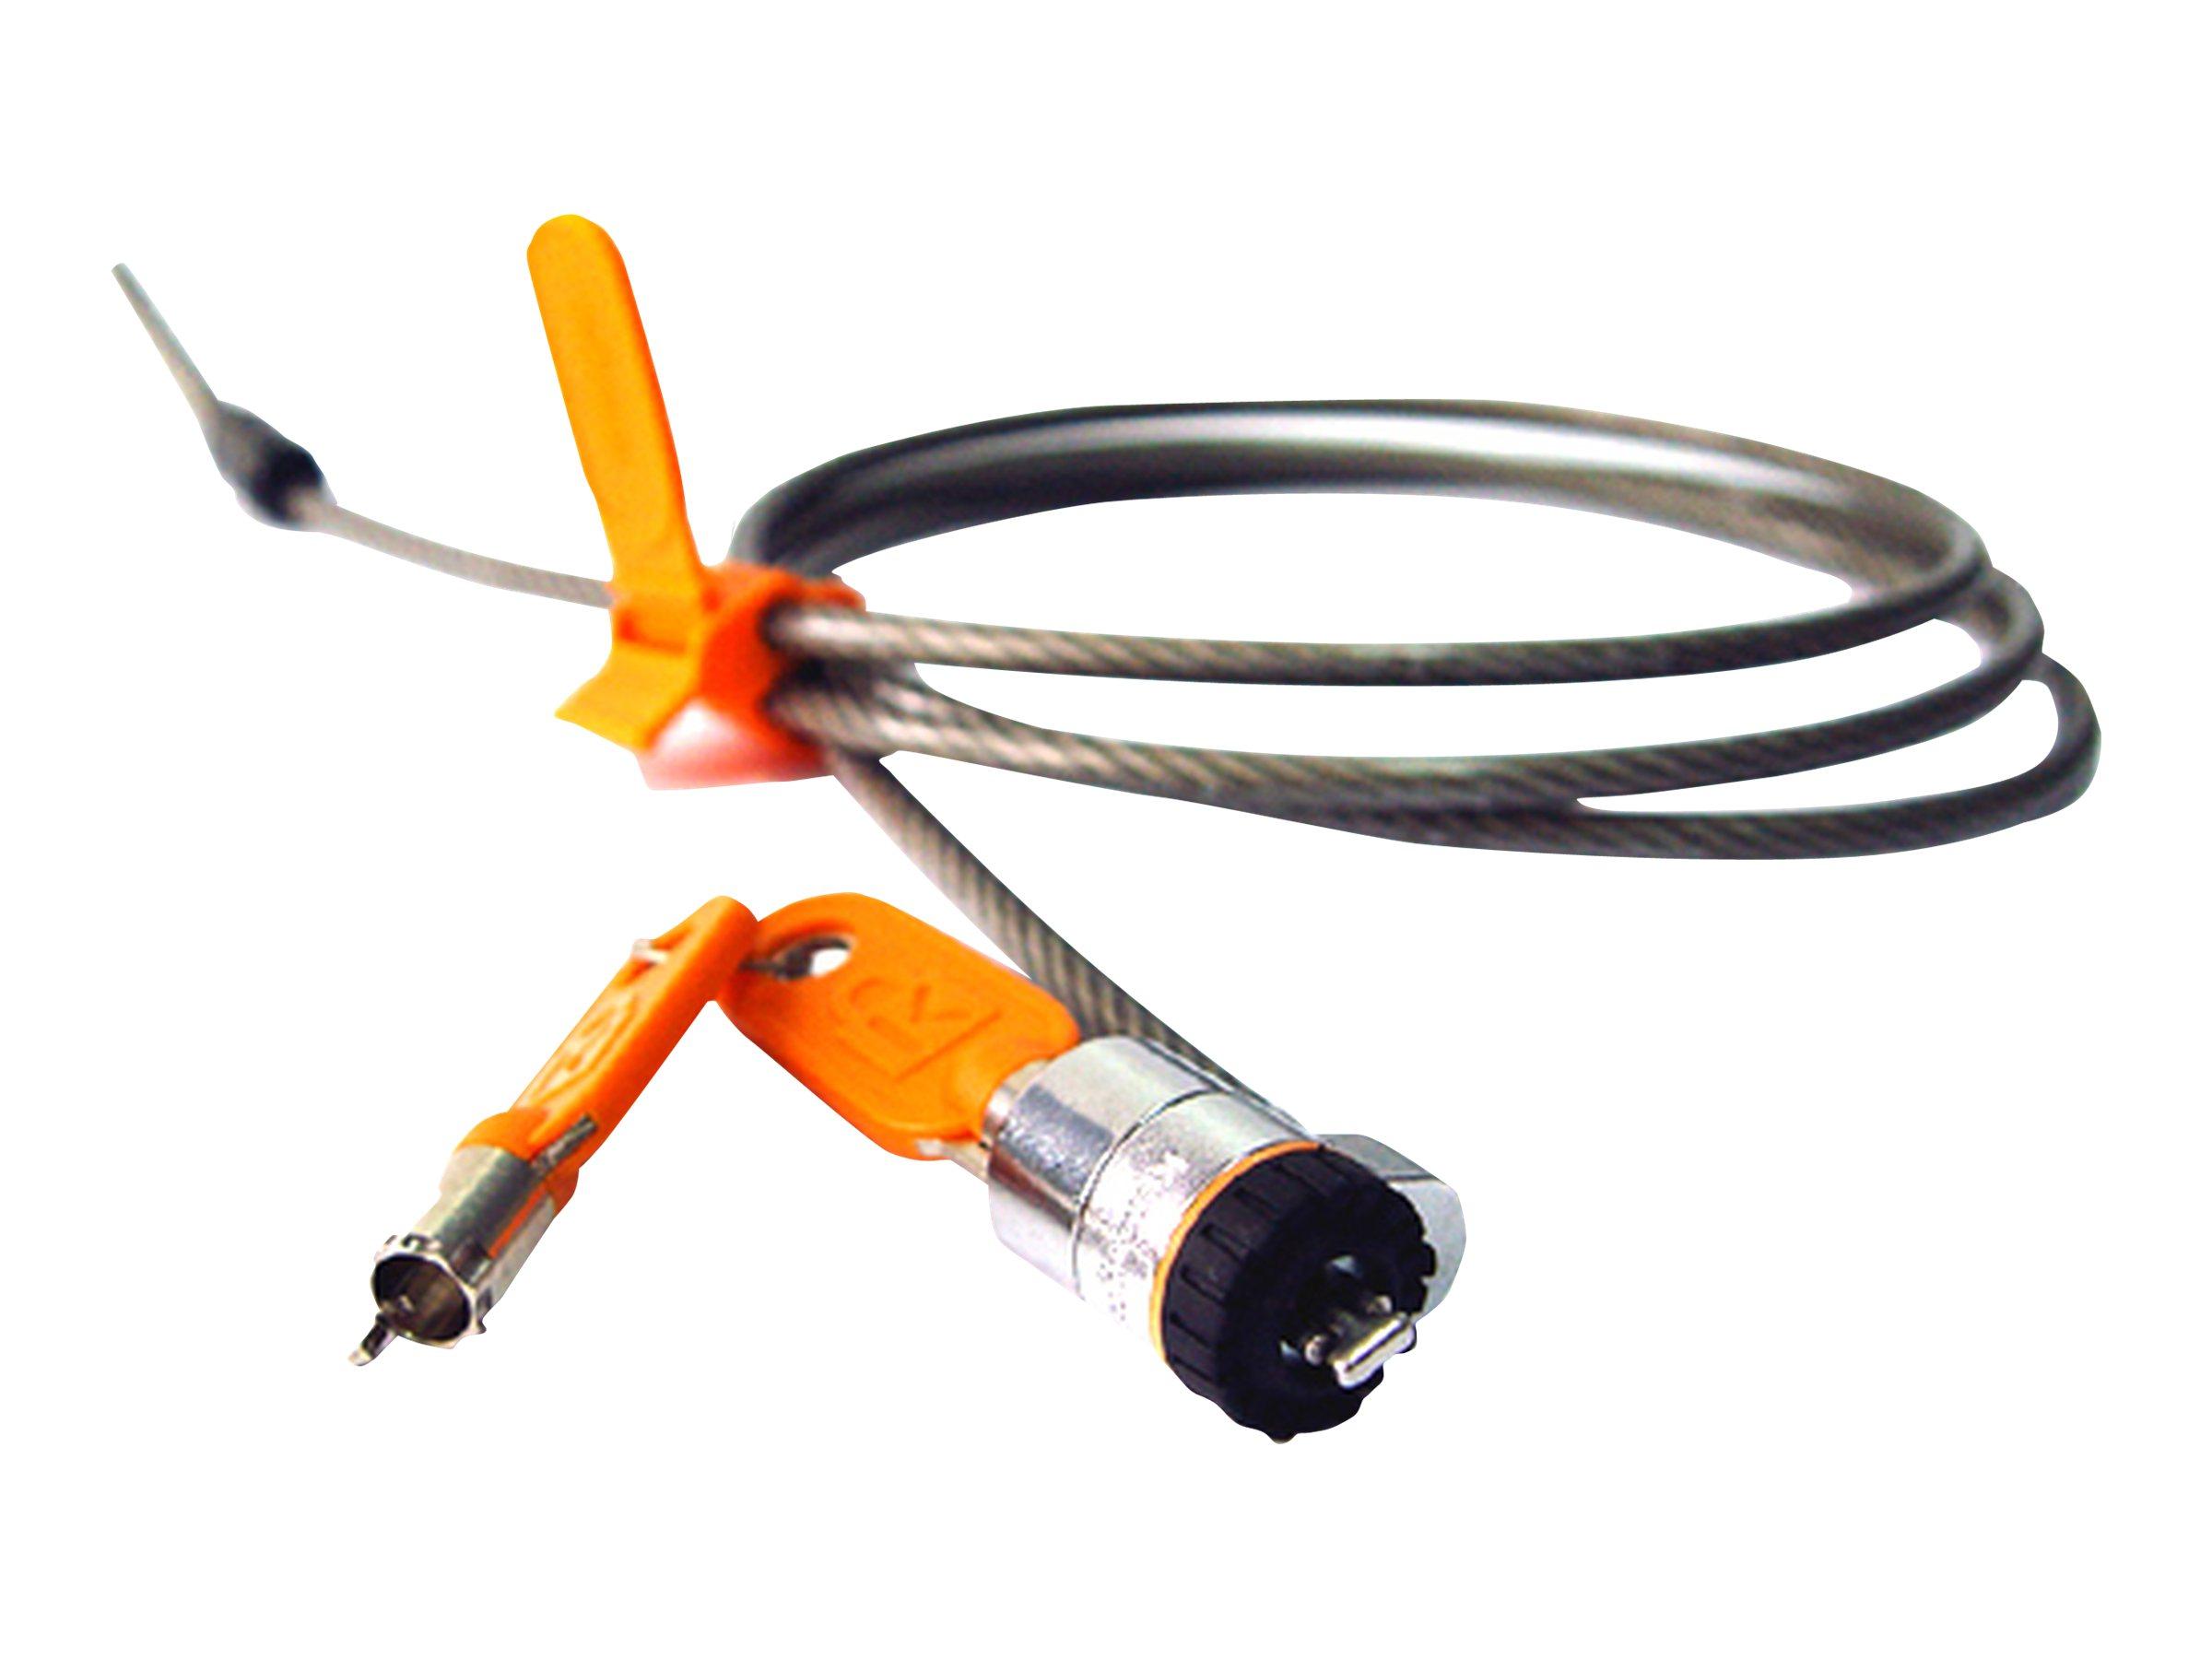 Kensington MicroSaver Keyed Notebook Lock security cable lock